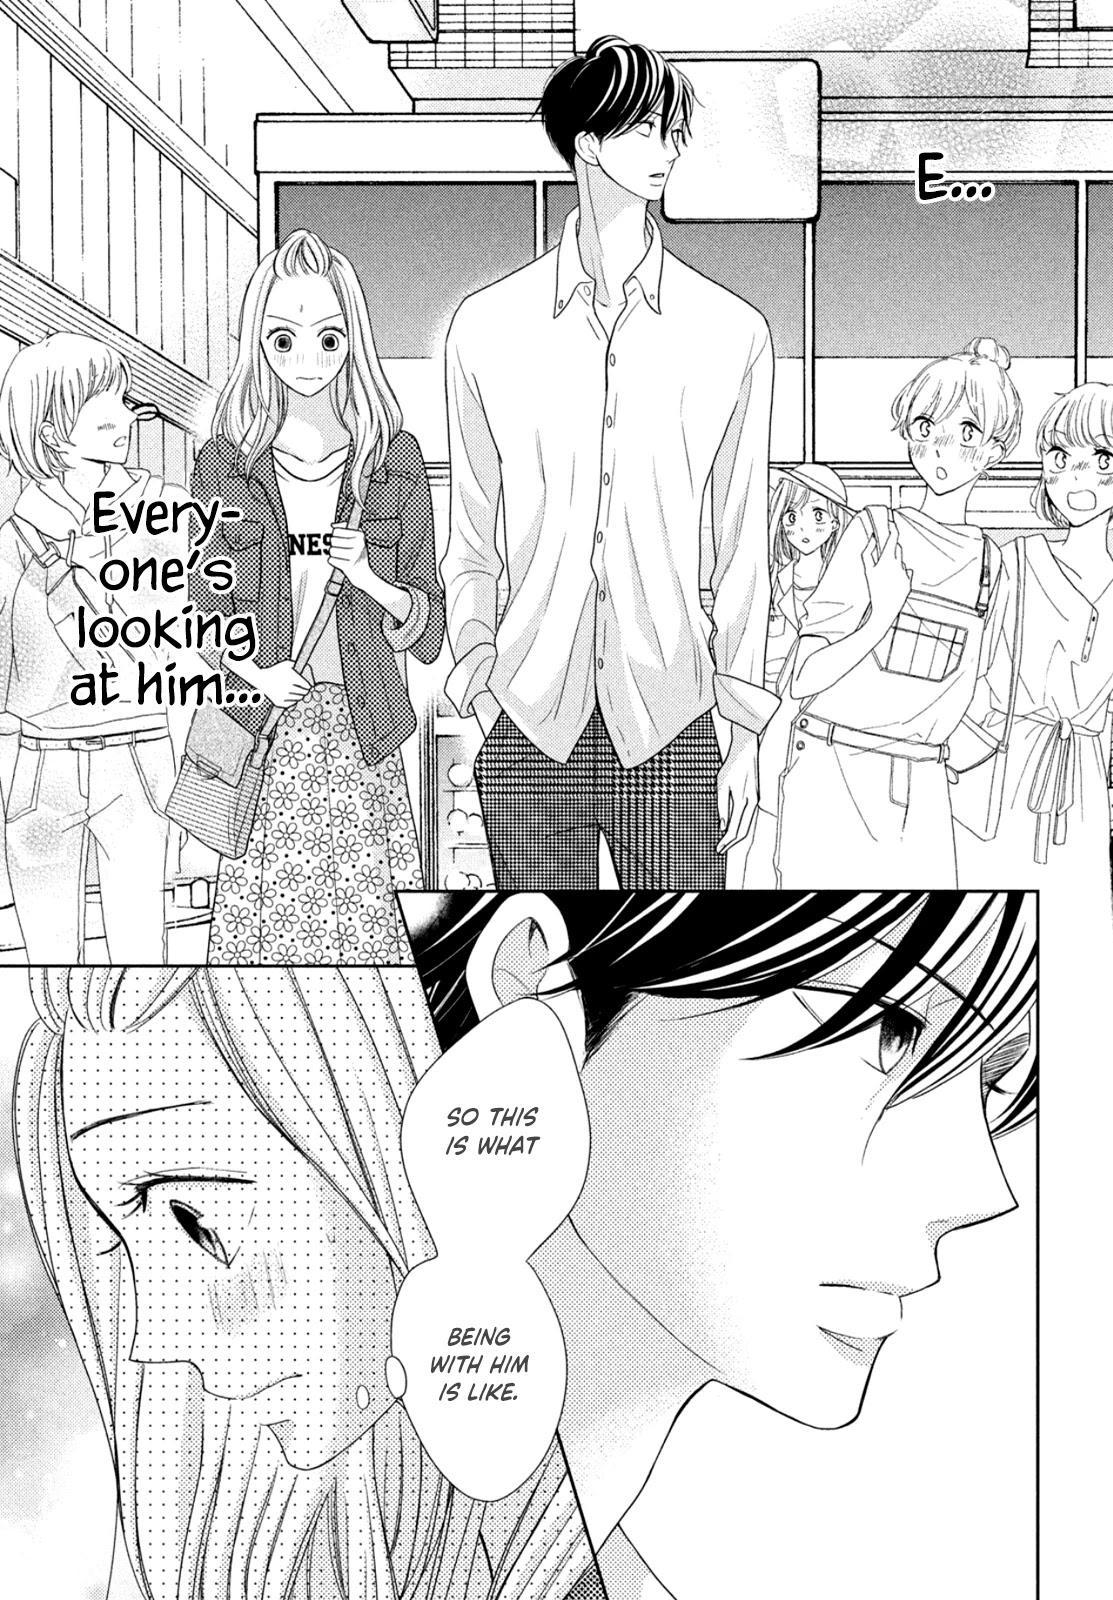 Arashi-Kun No Dakimakura Chapter 7: Because We're The Same page 11 - Mangakakalots.com